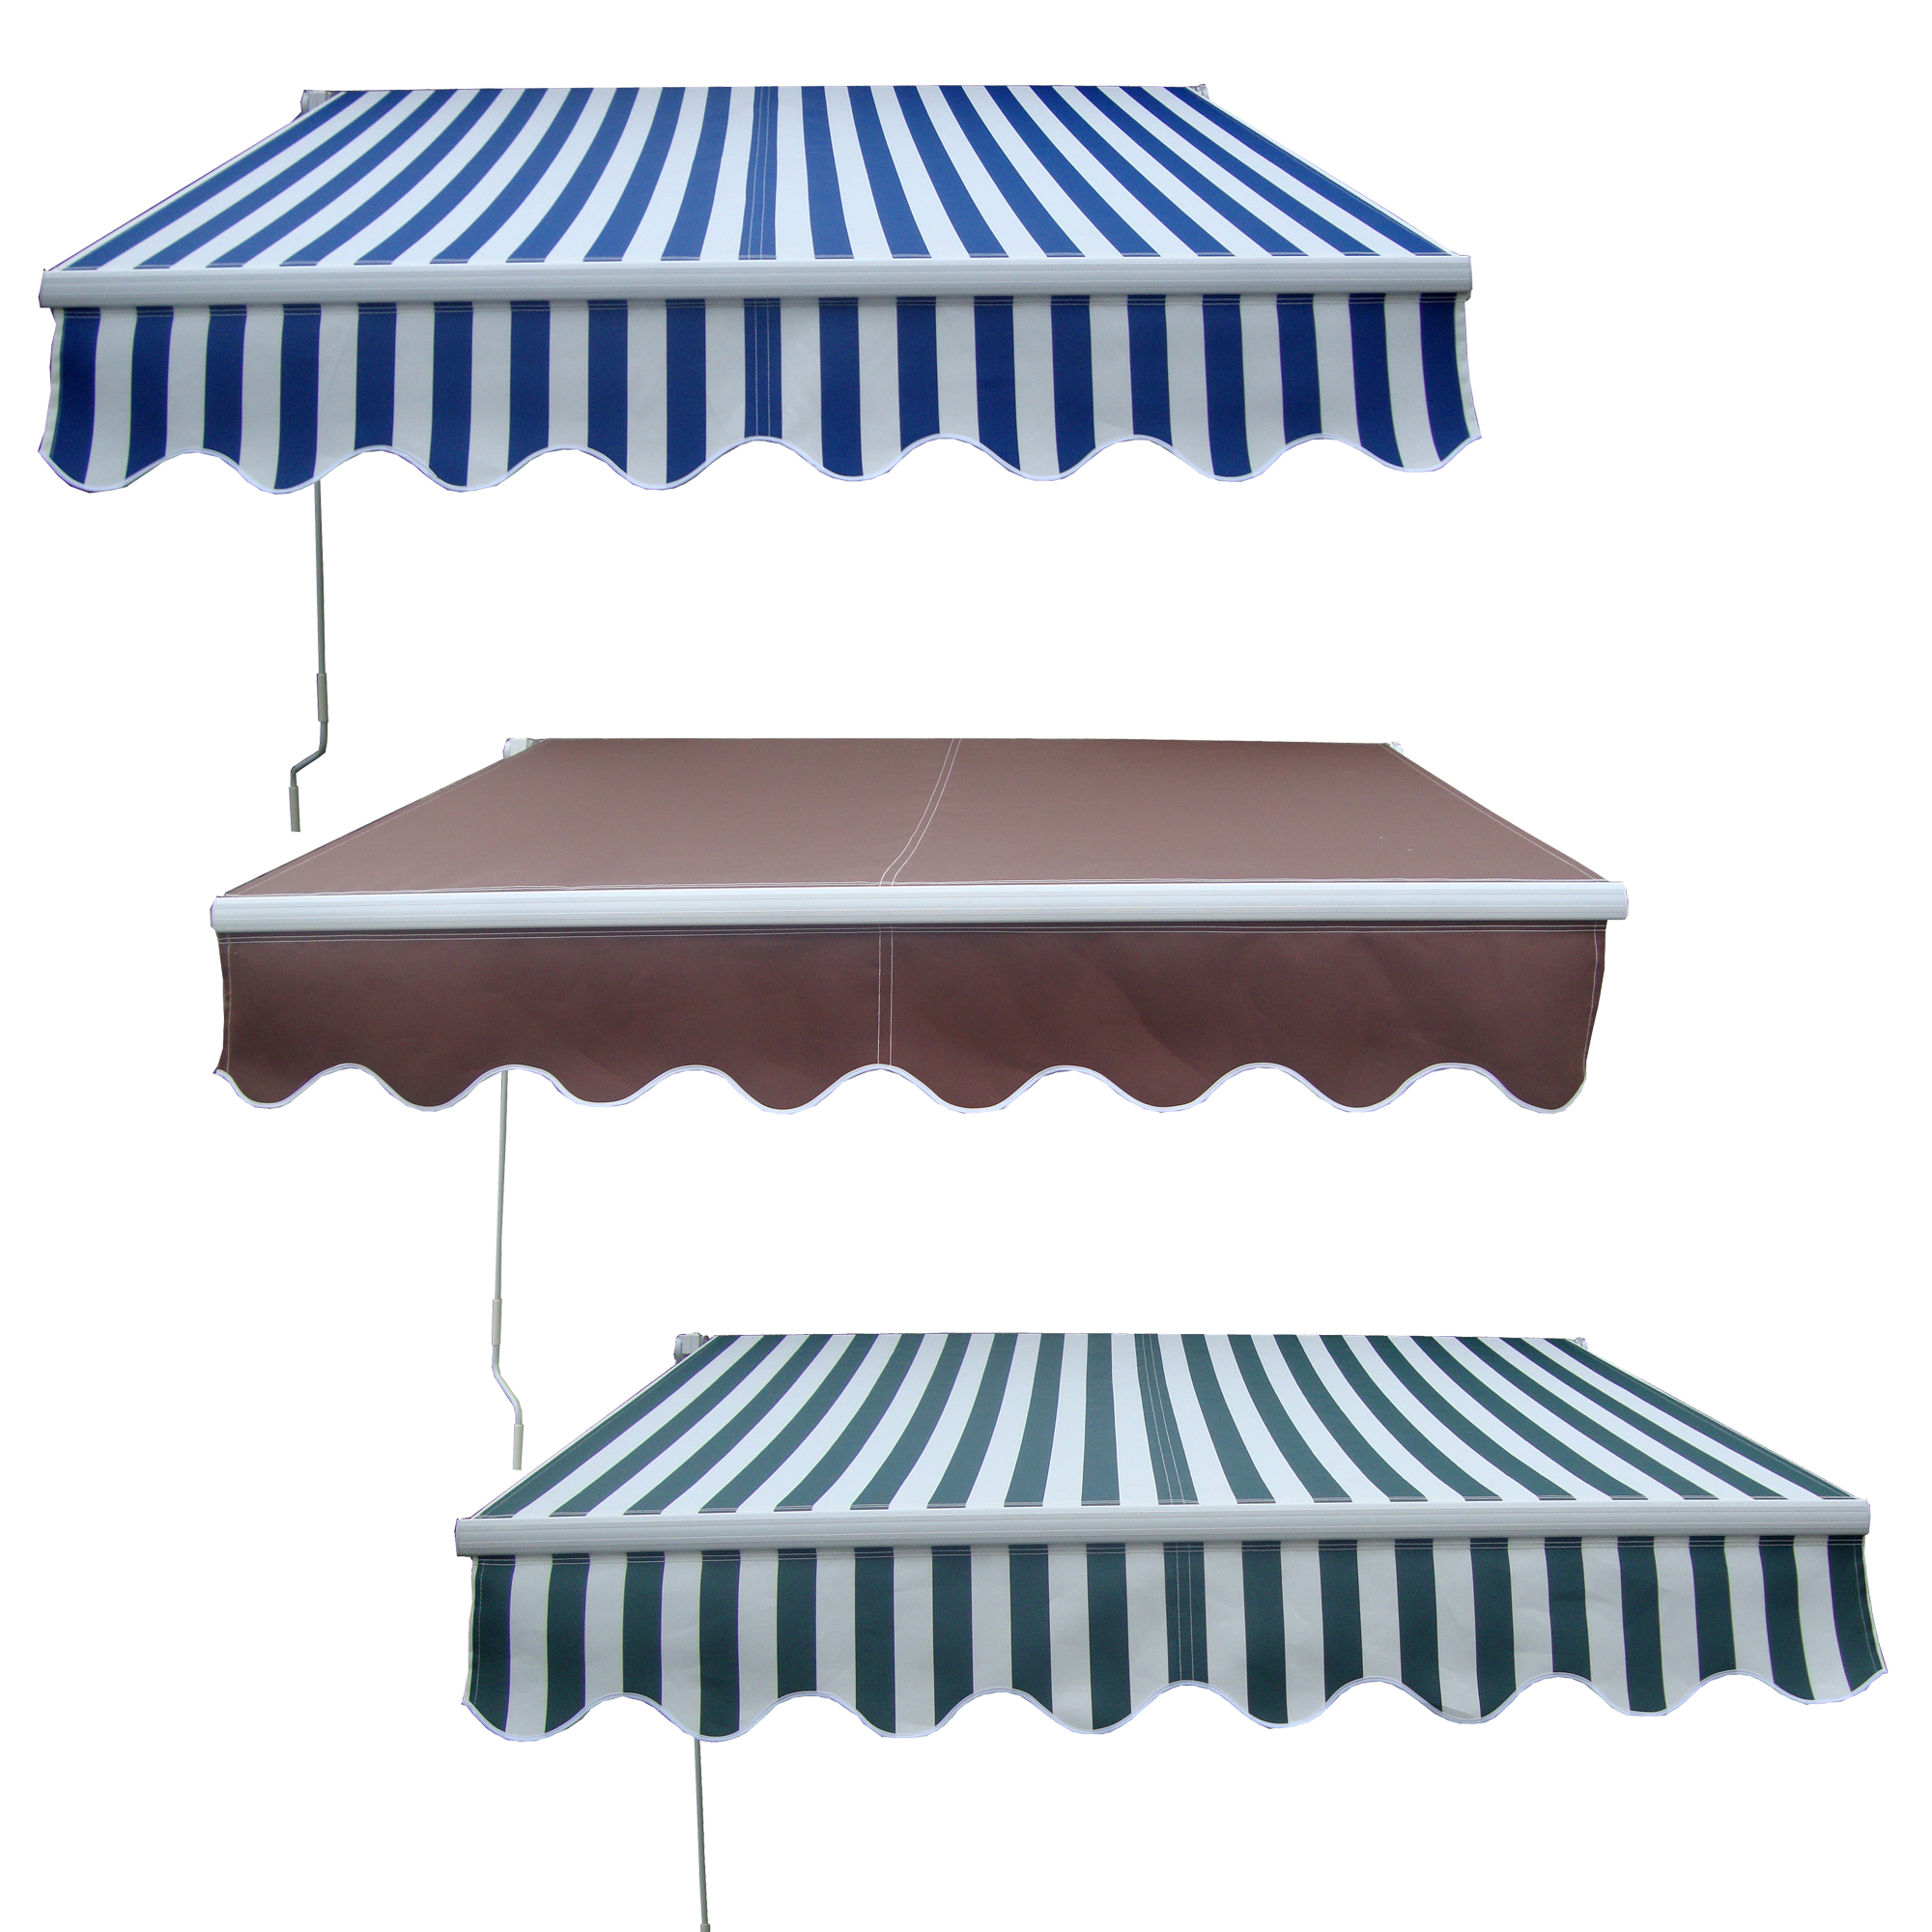 new manual aluminium retractable awning canopy garden